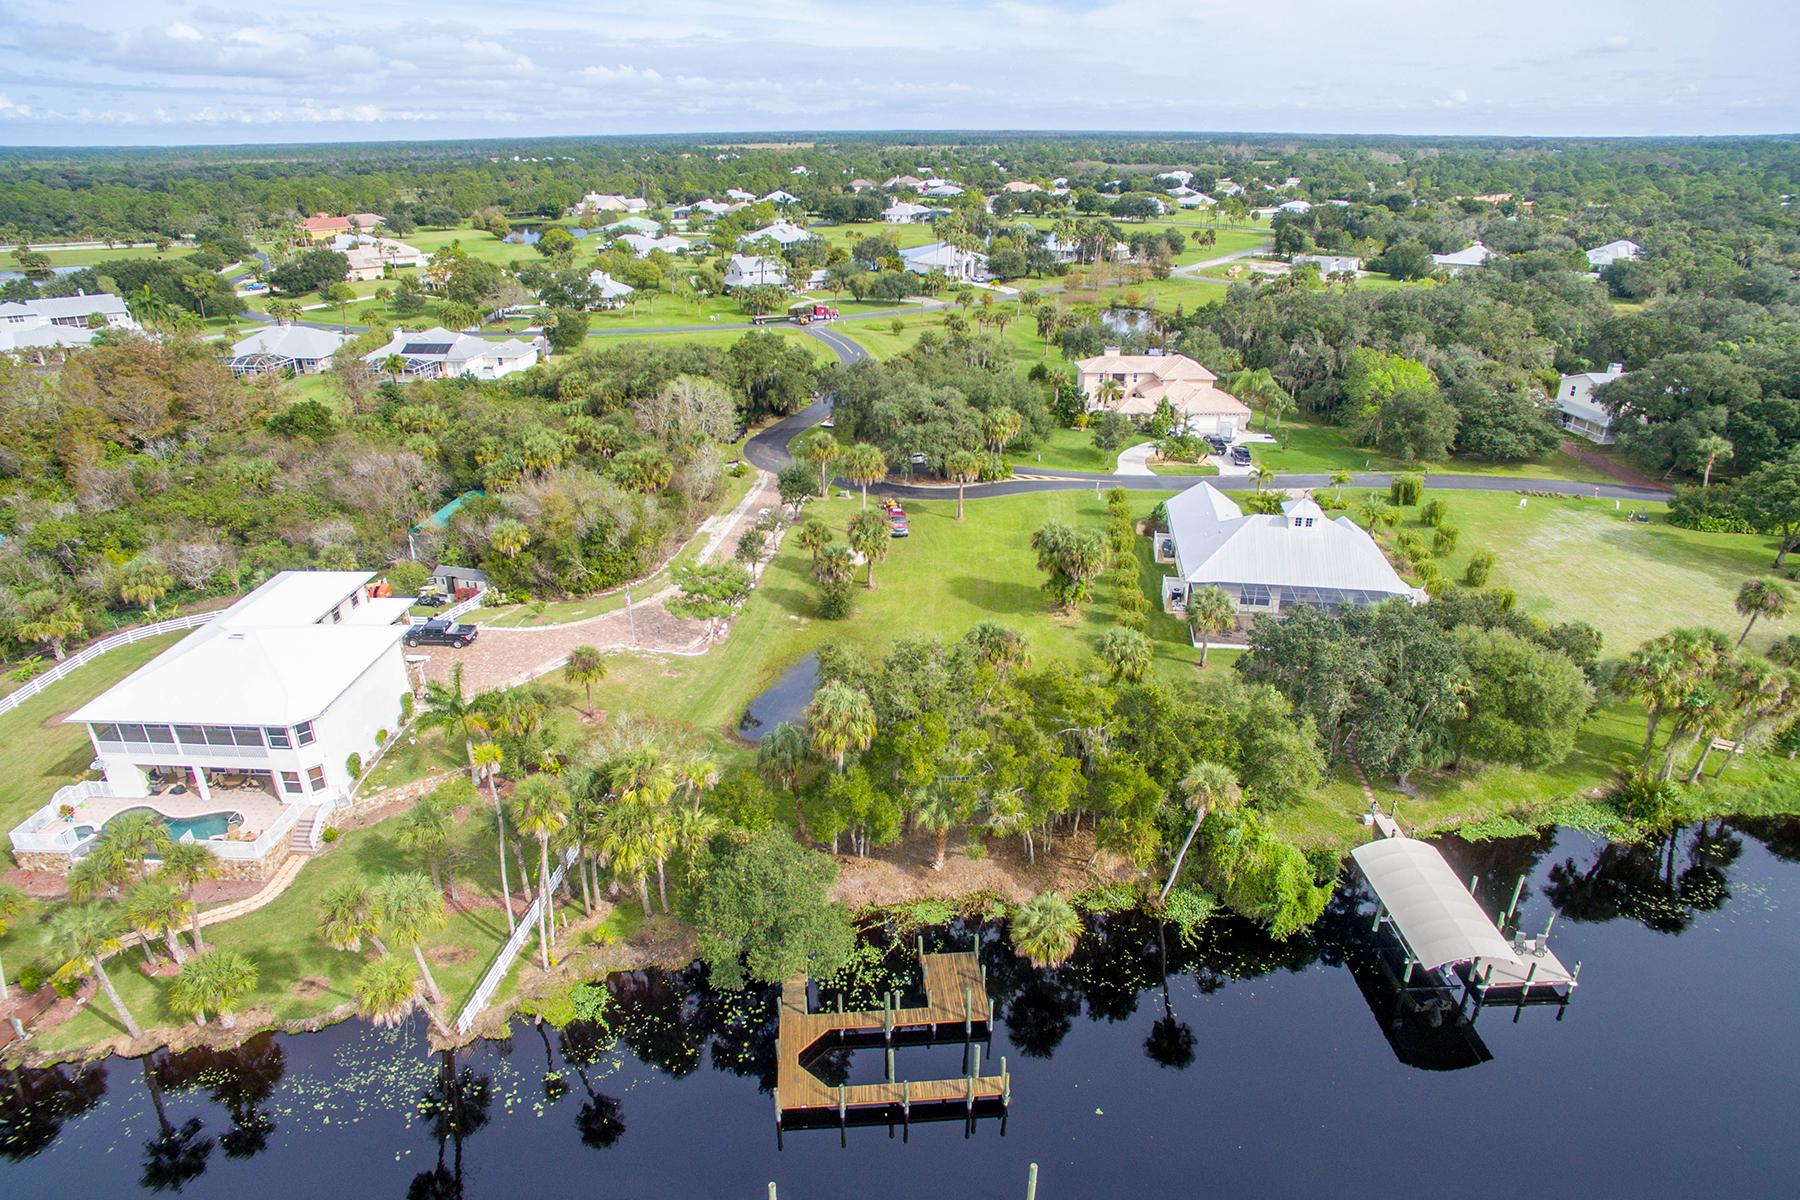 Land for Sale at ALVA 16420 Oakview Cir Alva, Florida 33920 United States